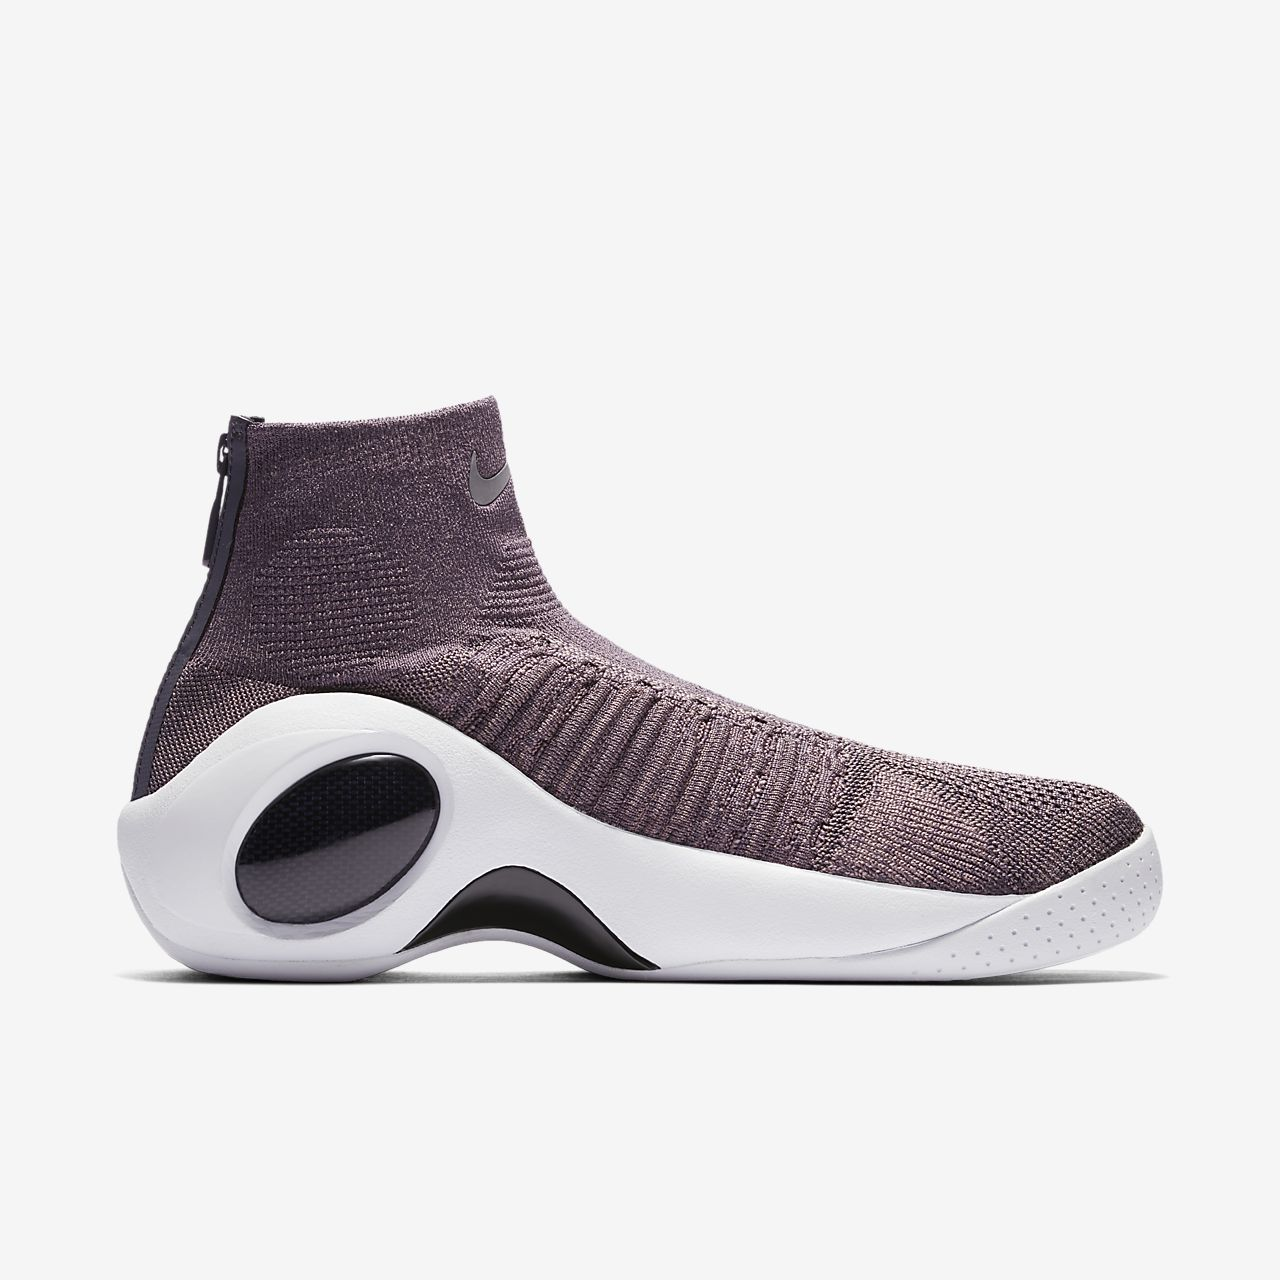 check out a819f 29f0d ... Chaussure Nike Flight Bonafide pour Homme